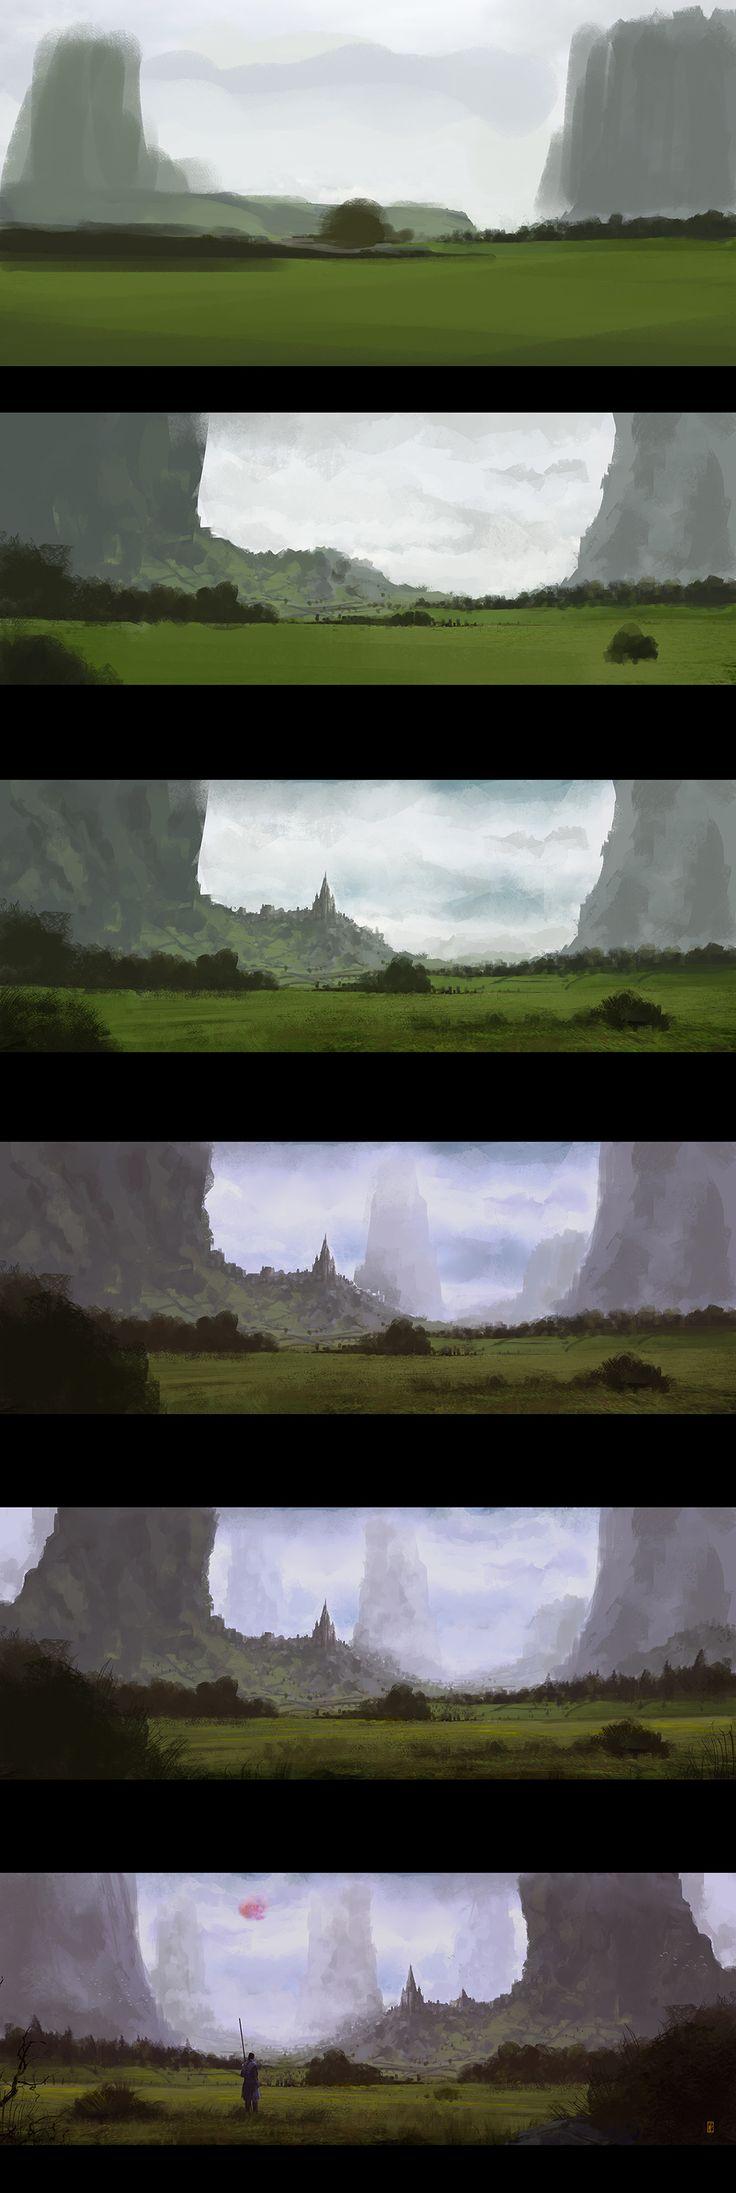 last_kingdom_steps_by_donmalo-d5yk2wq.jpg (1050×3130) via cgpin.com